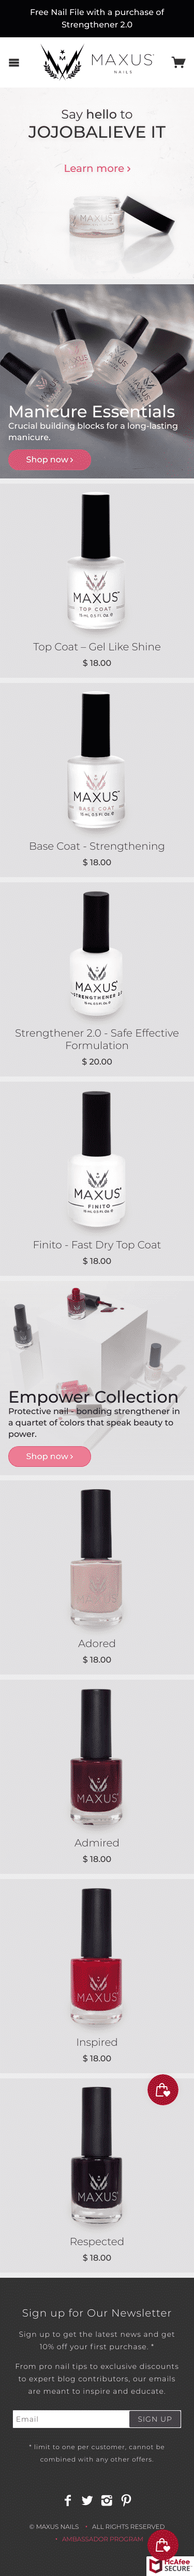 Maxus Nails Coupon